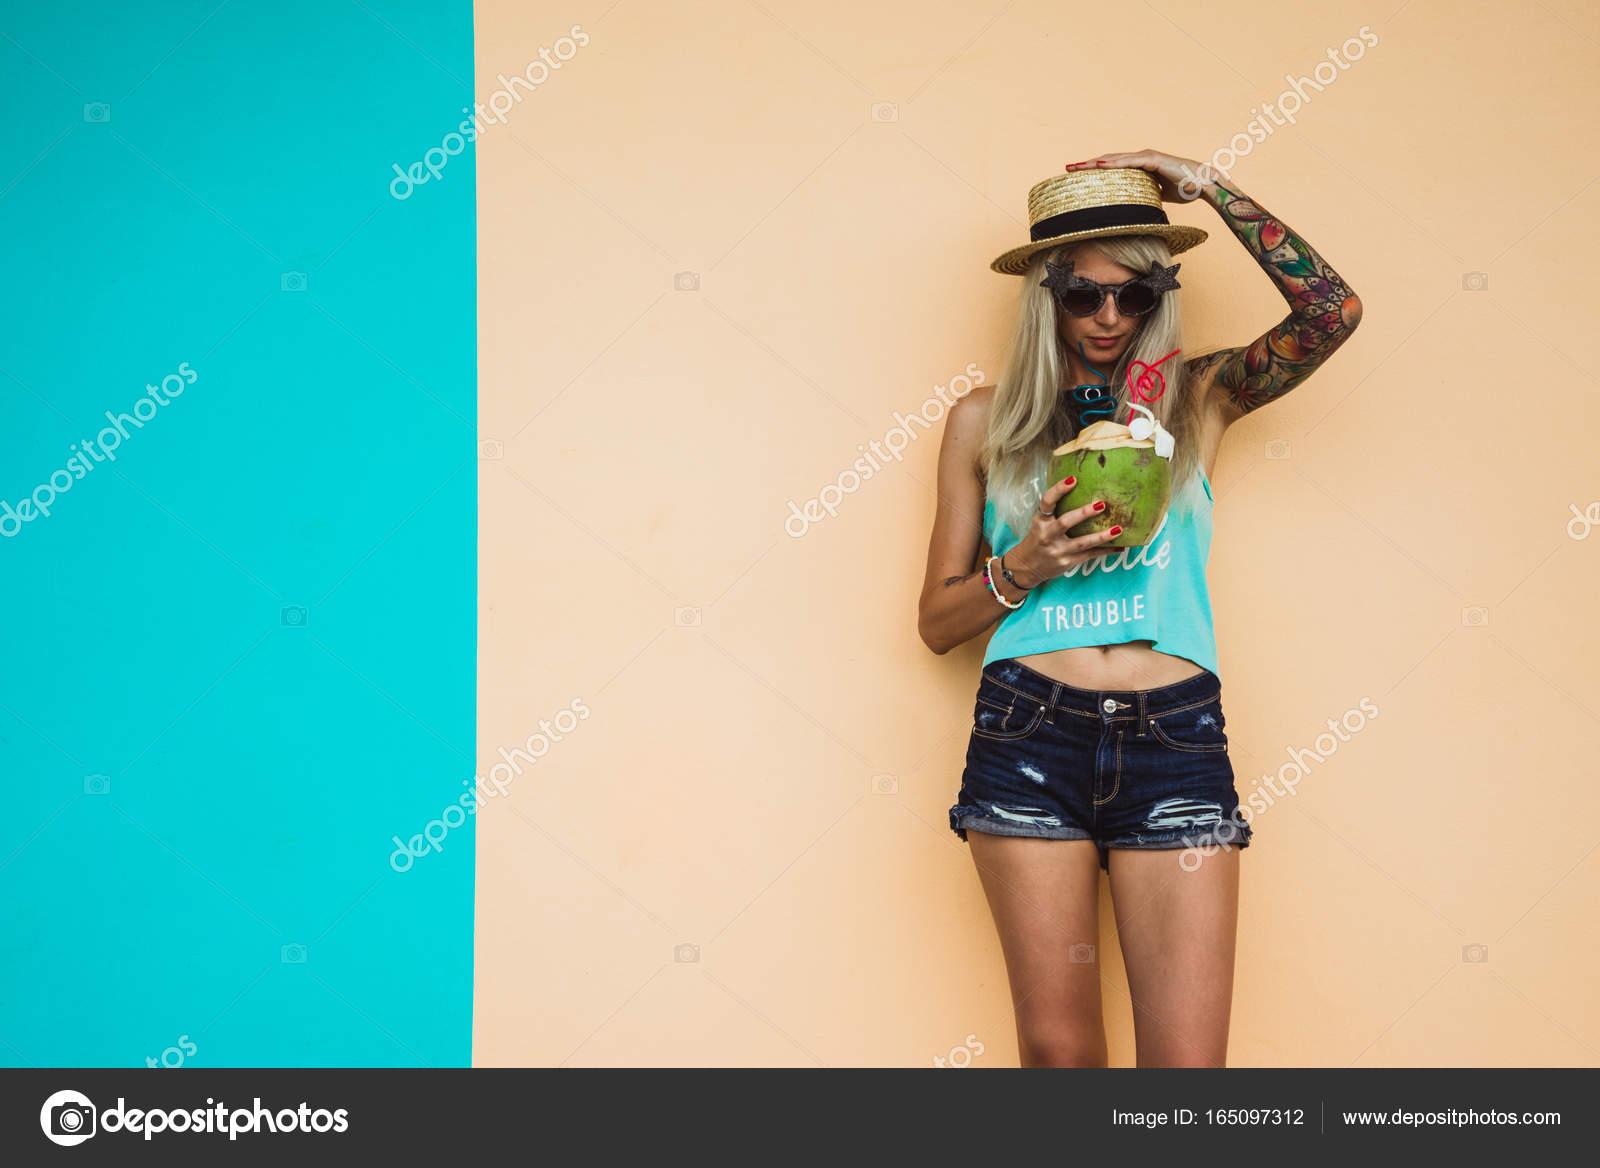 ec4225733c6 Όμορφη νεαρή ξανθιά hipster στο τζιν σορτς και ένα ψάθινο καπέλο ...